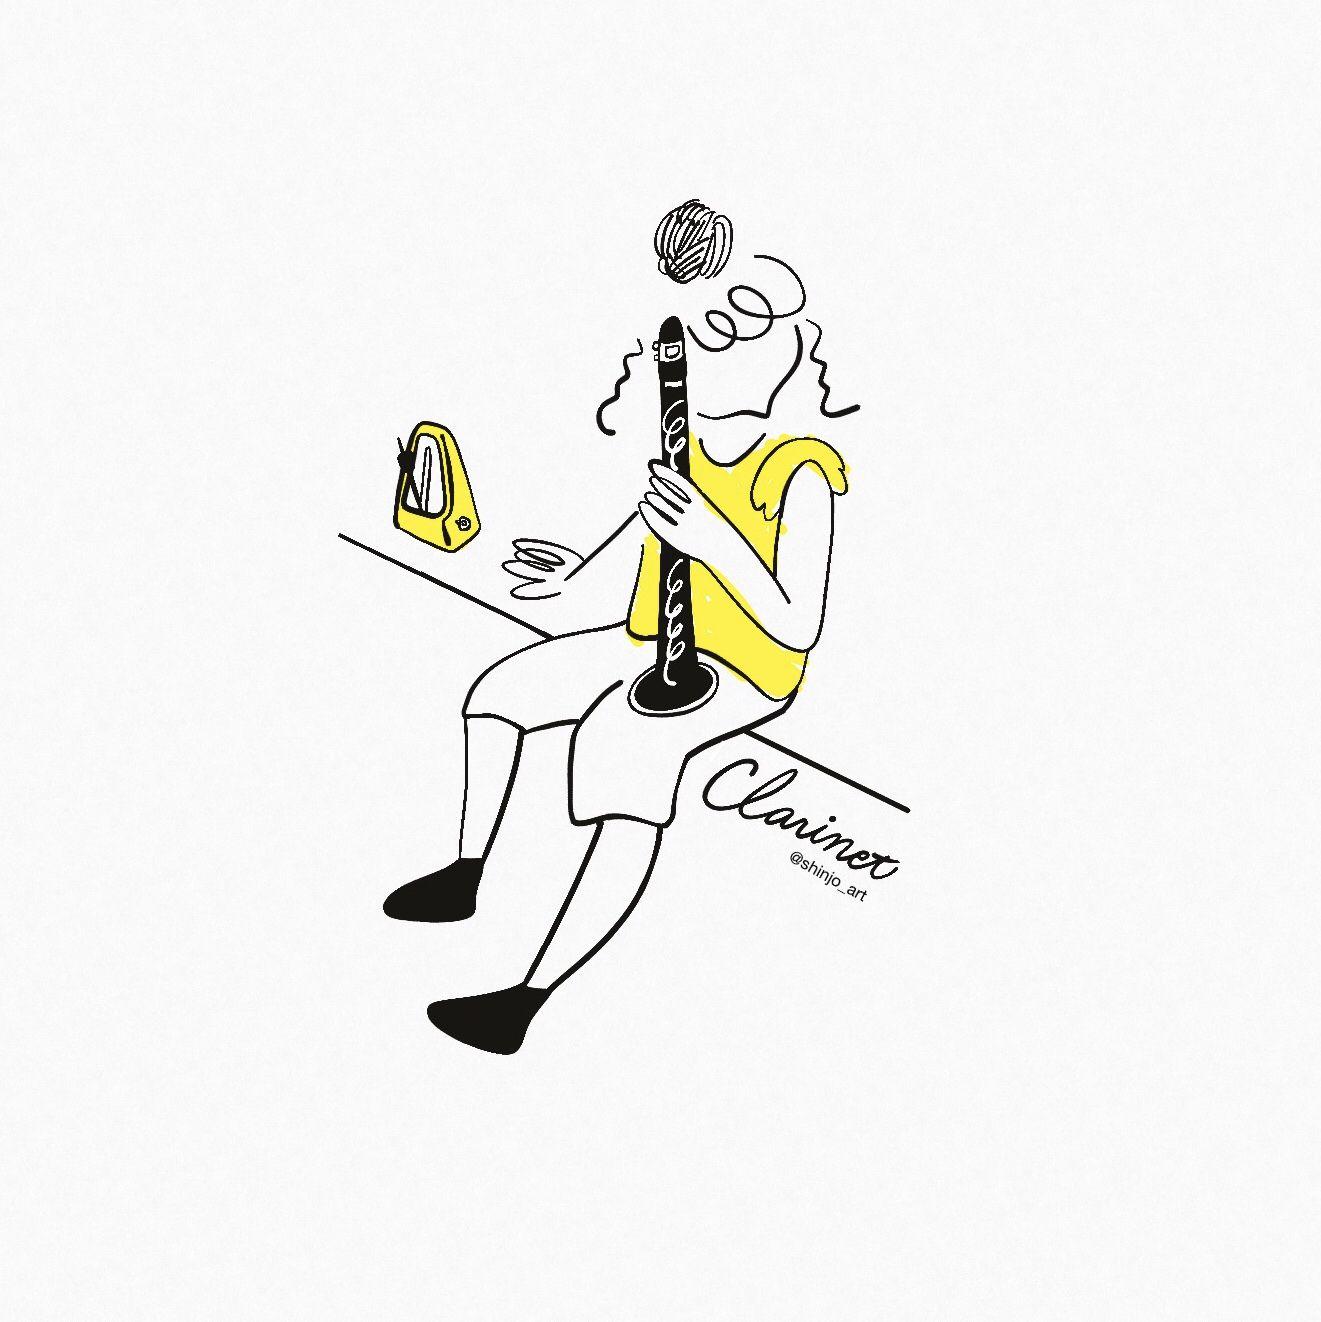 Play Clarinet 吹奏楽 イラスト 楽器 イラスト クラリネット